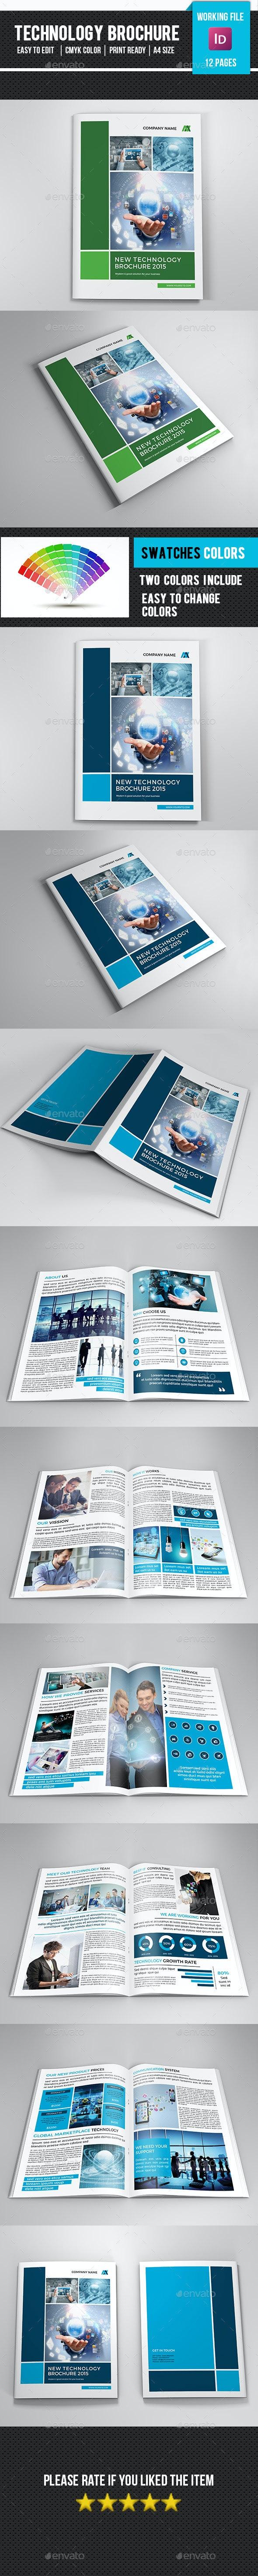 Corporate Technology Brochure-V314 - Corporate Brochures